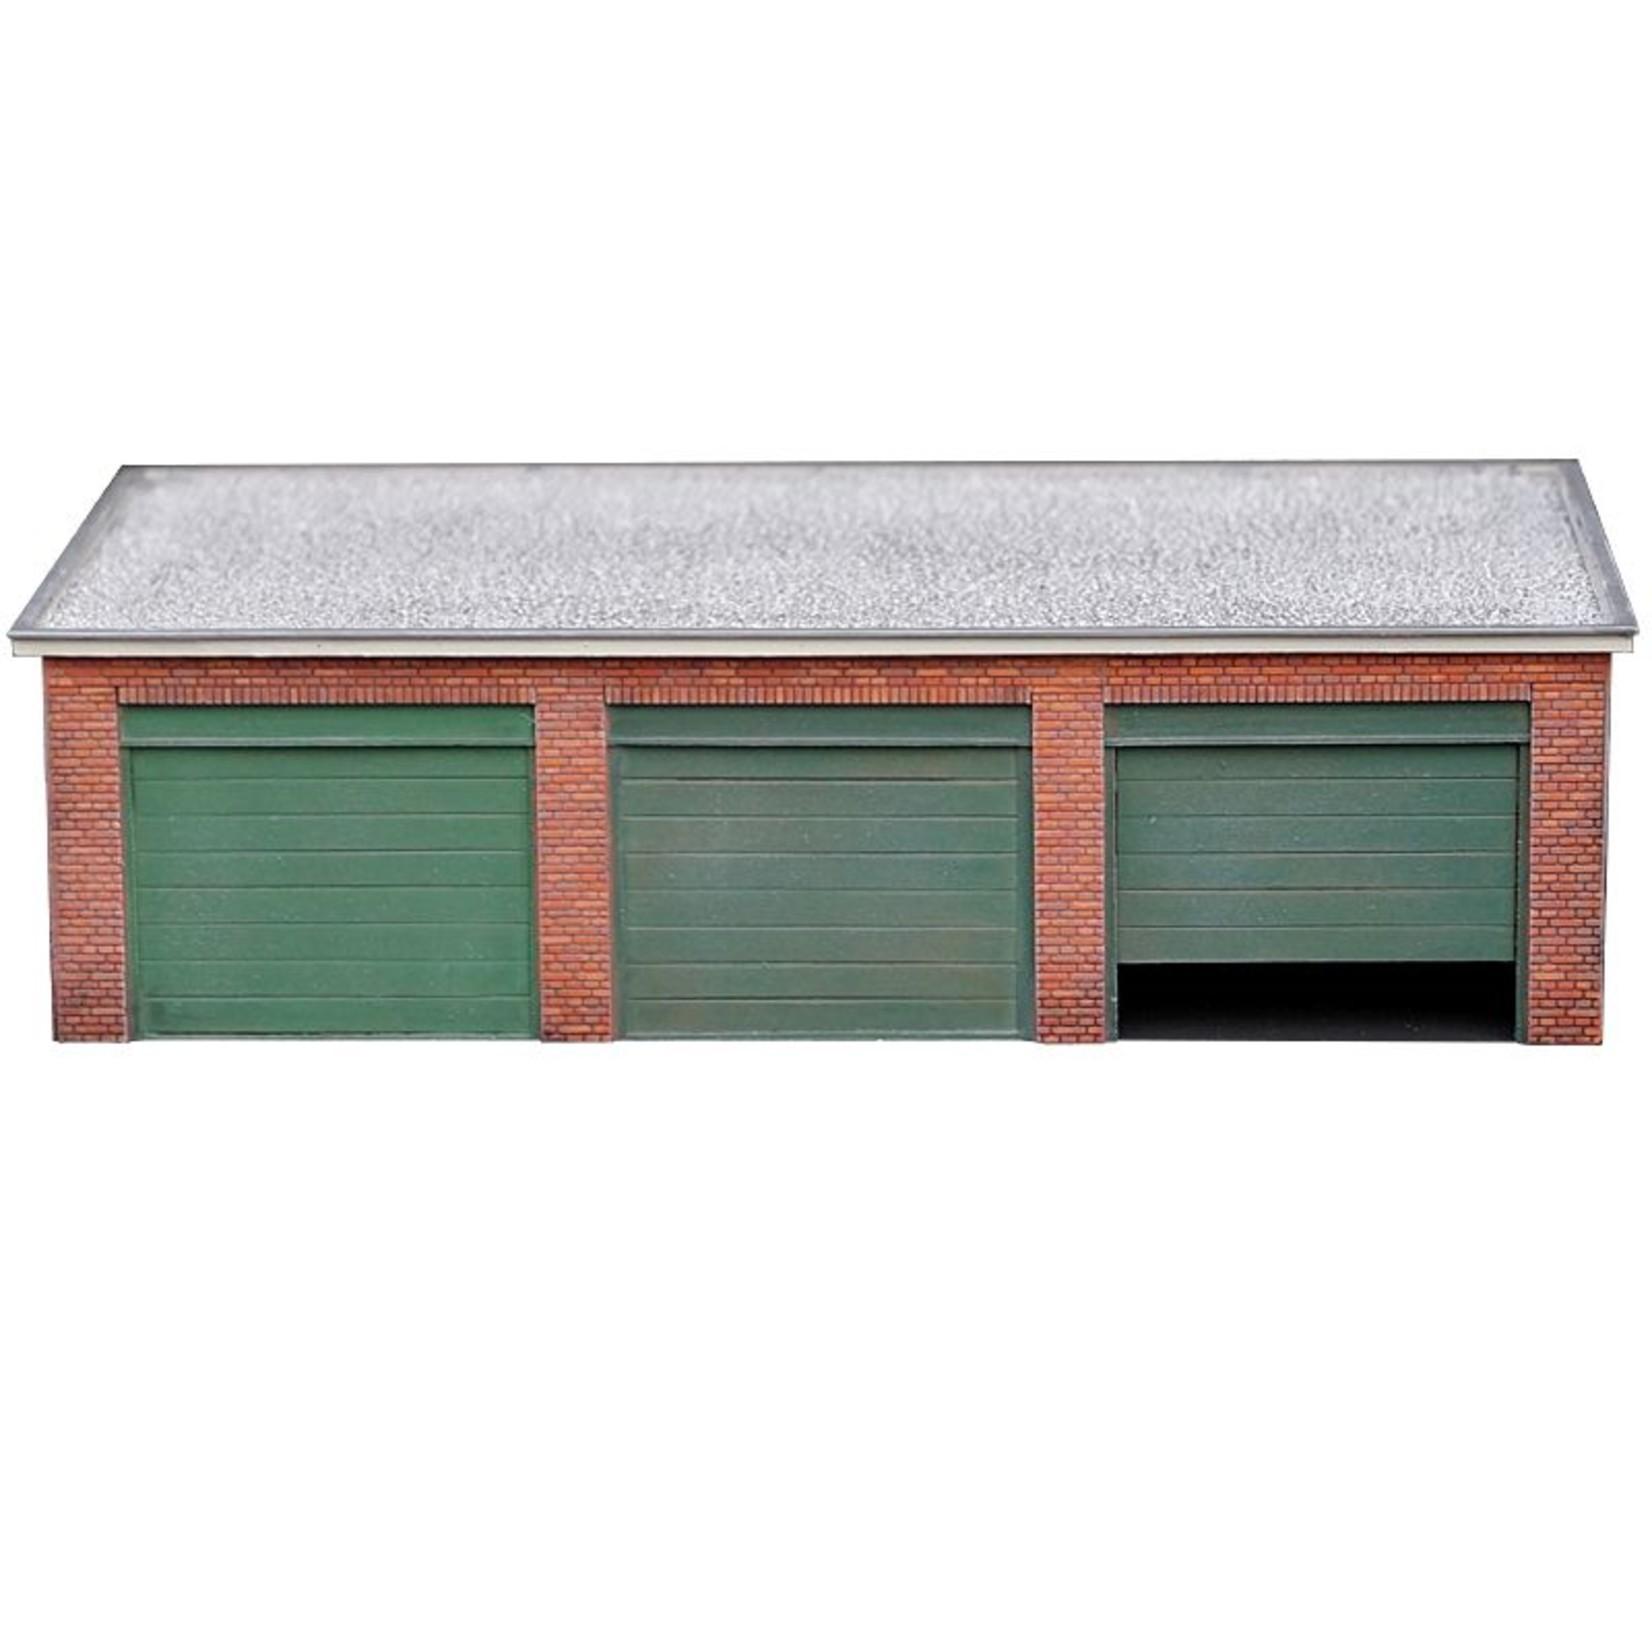 Brick garage flat roof